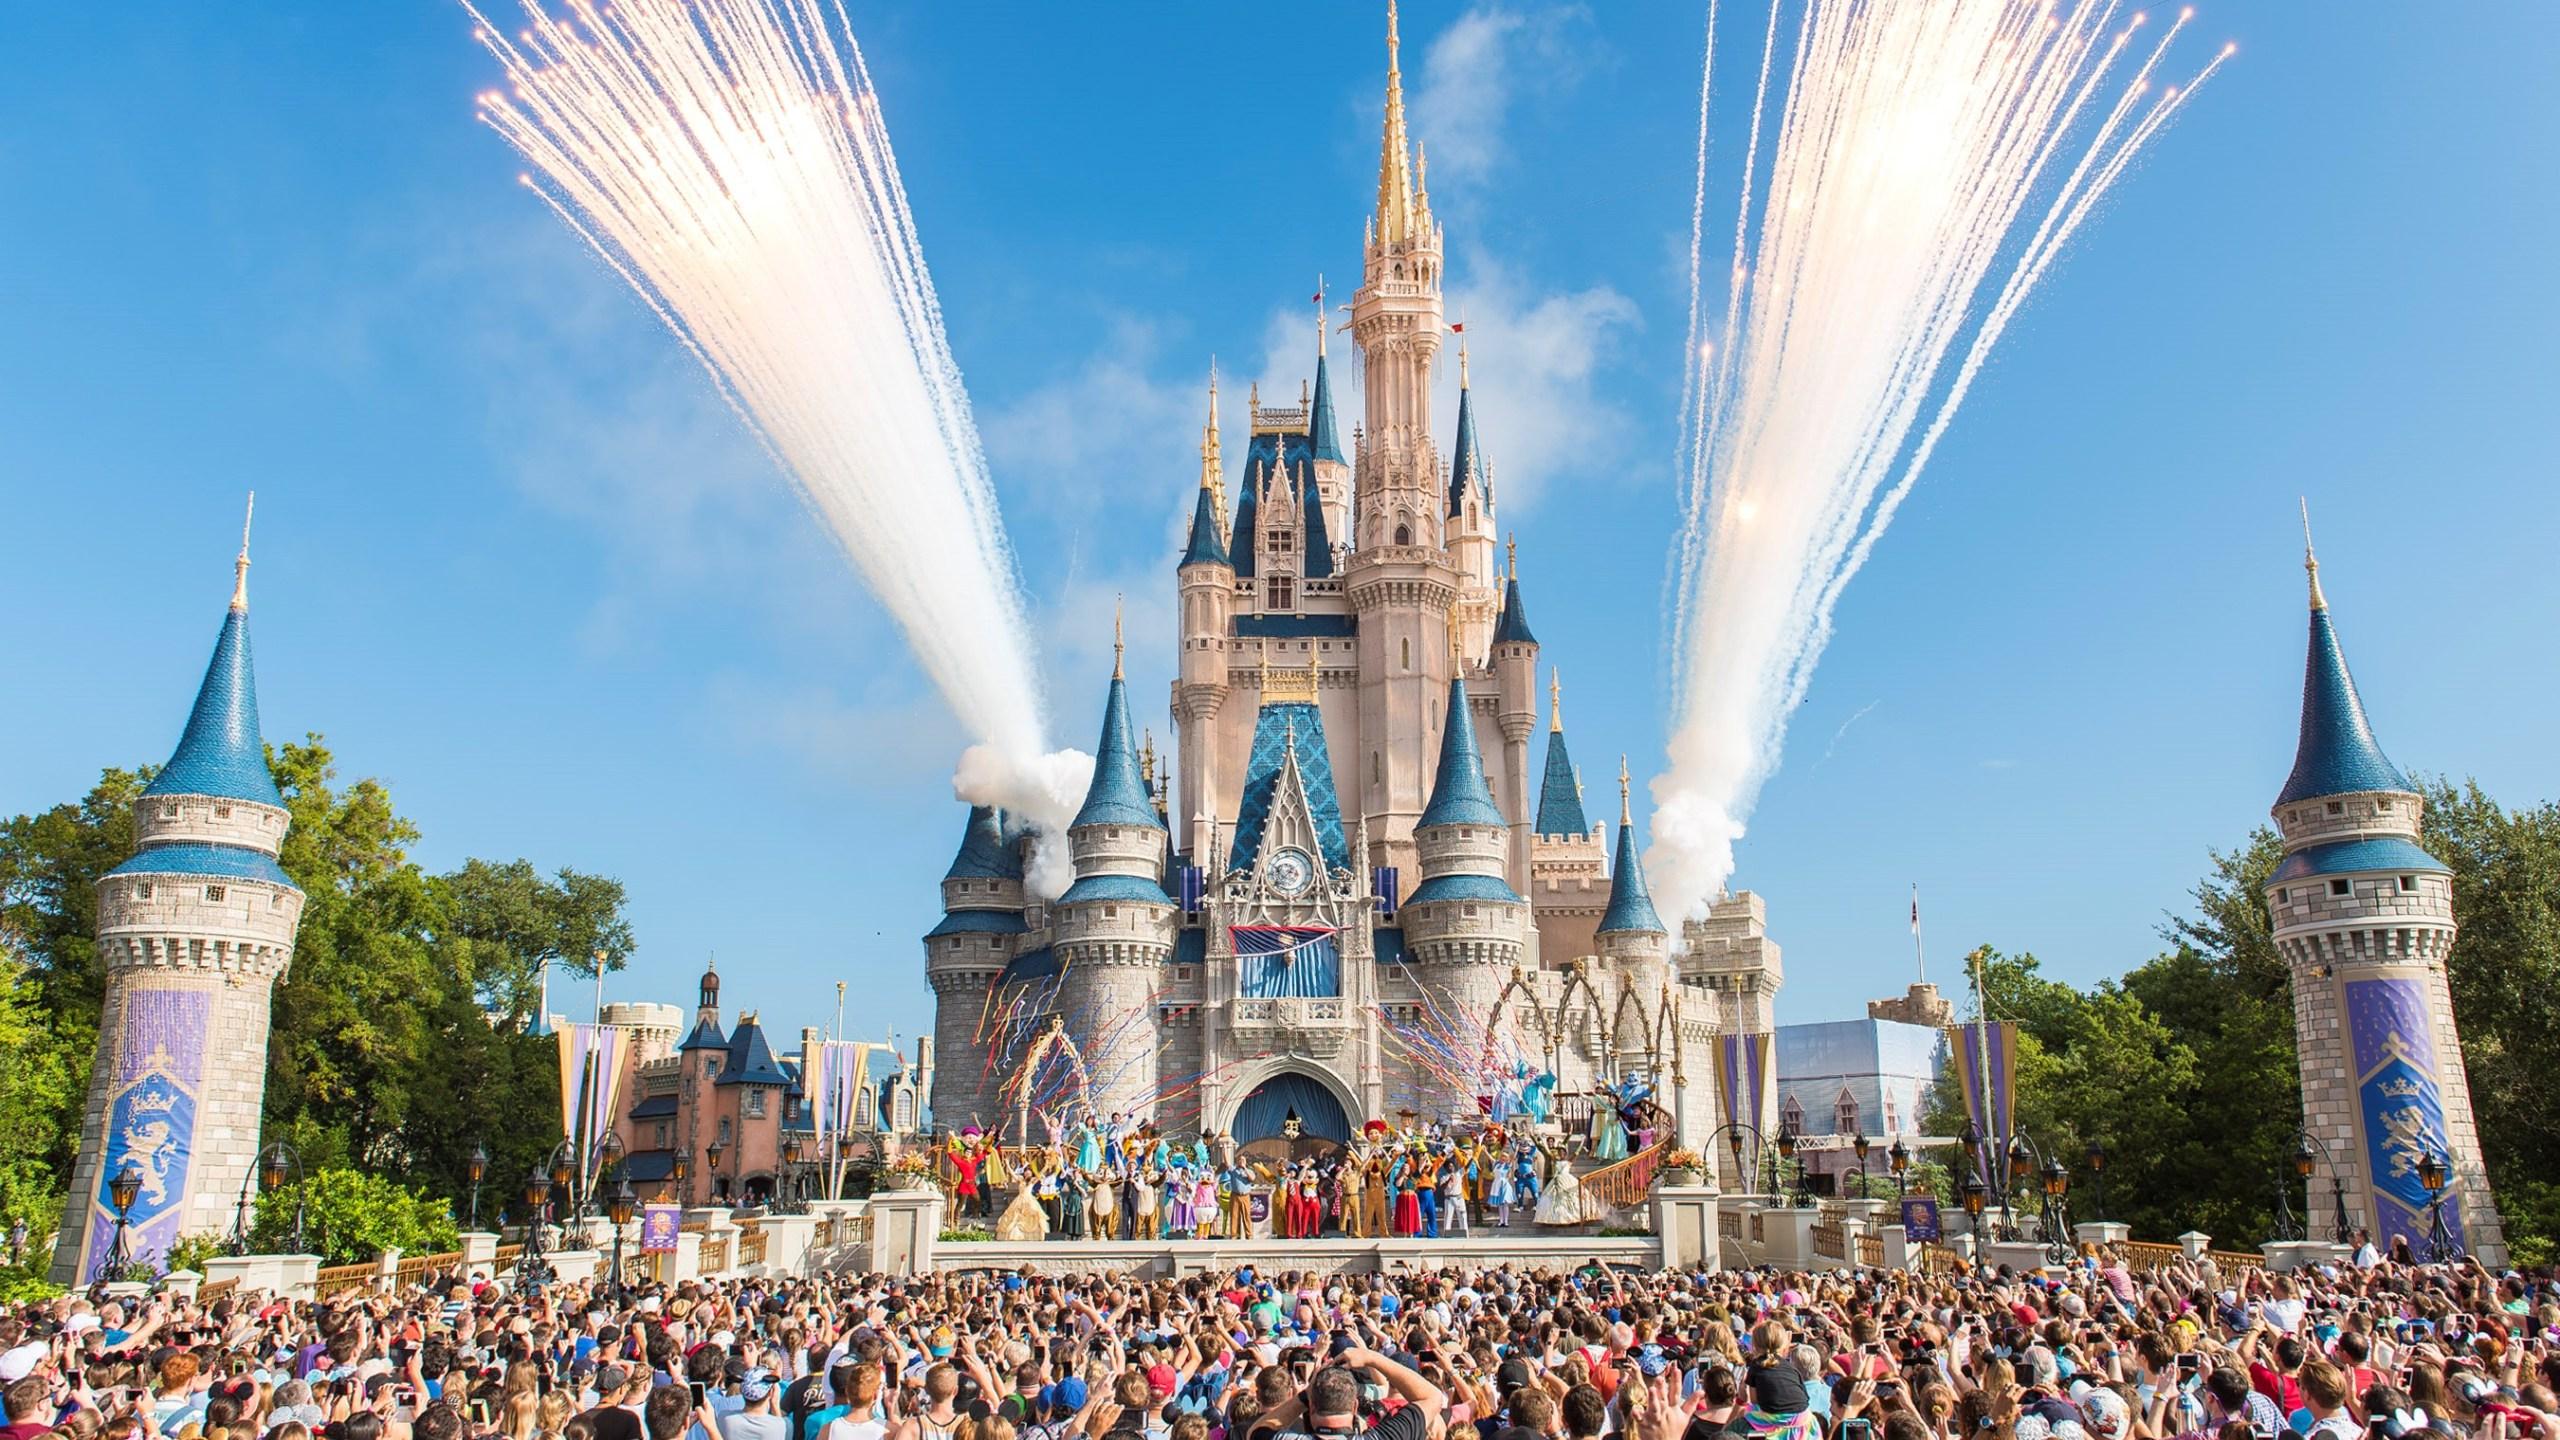 Walt Disney World Resort marked its 45th anniversary on October 1, 2016 in Lake Buena Vista, Florida. (Credit: Jacqueline Nell/Disneyland Resort via Getty Images)